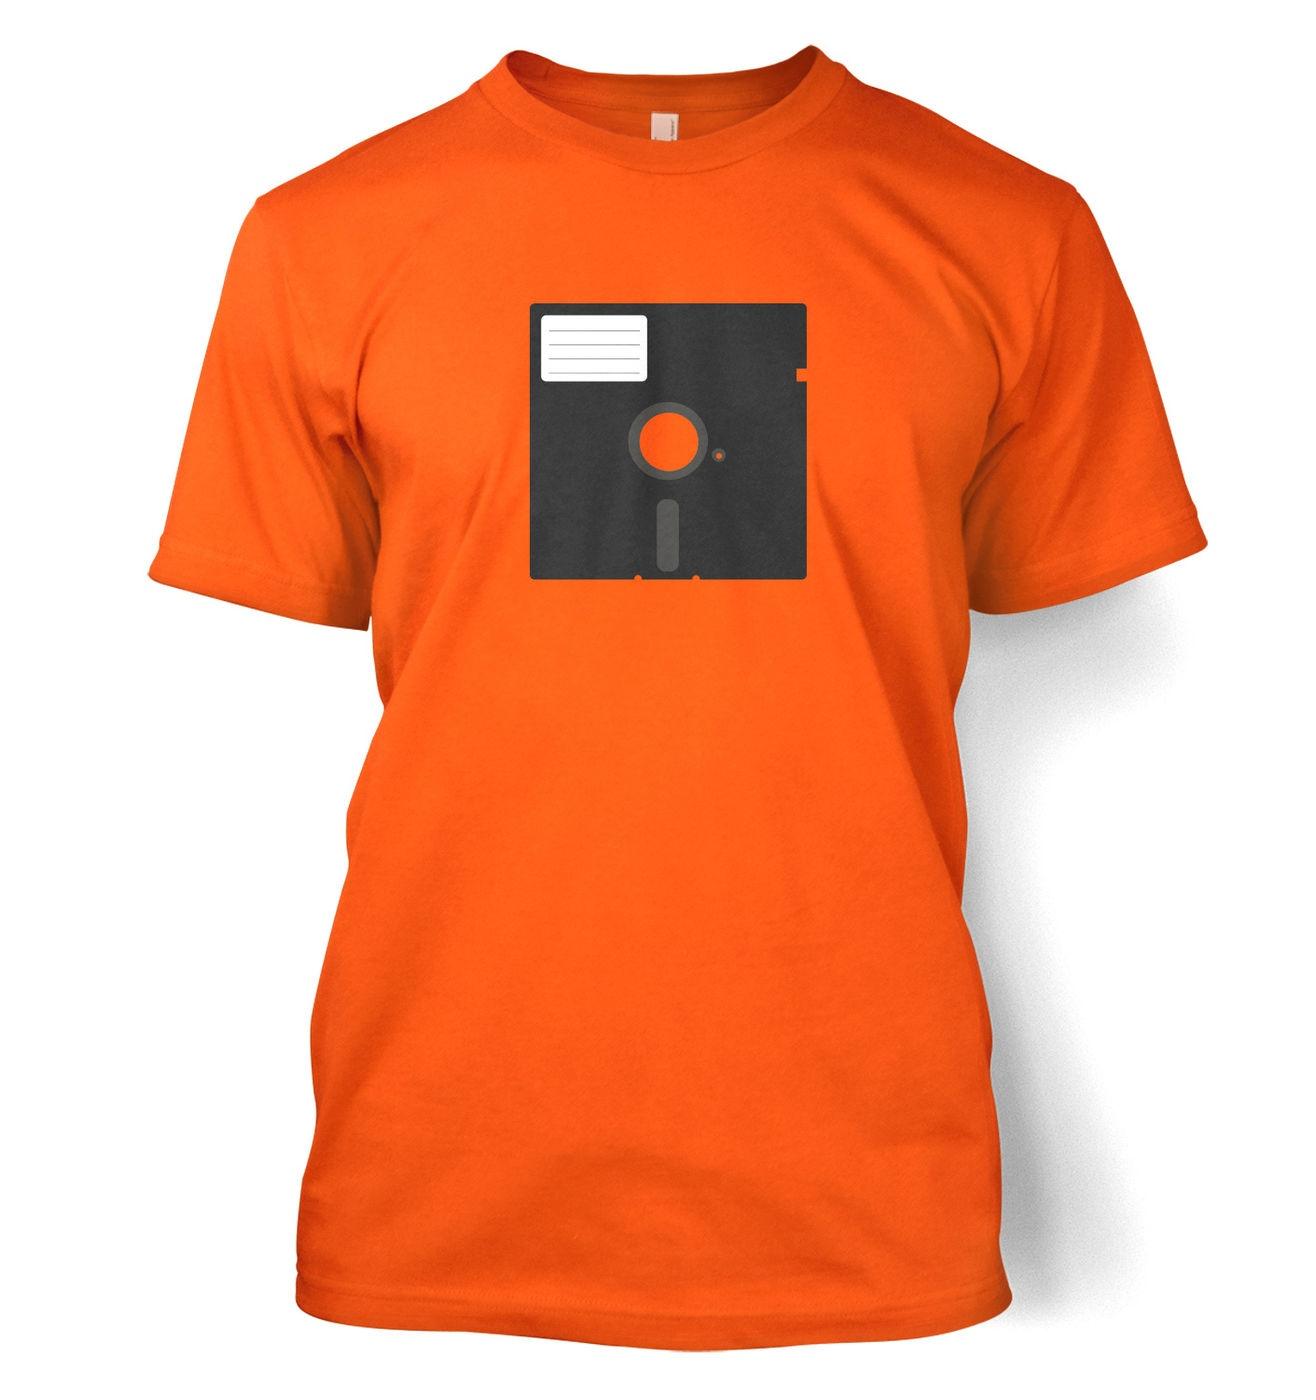 5.25 Inch Floppy Disk t-shirt